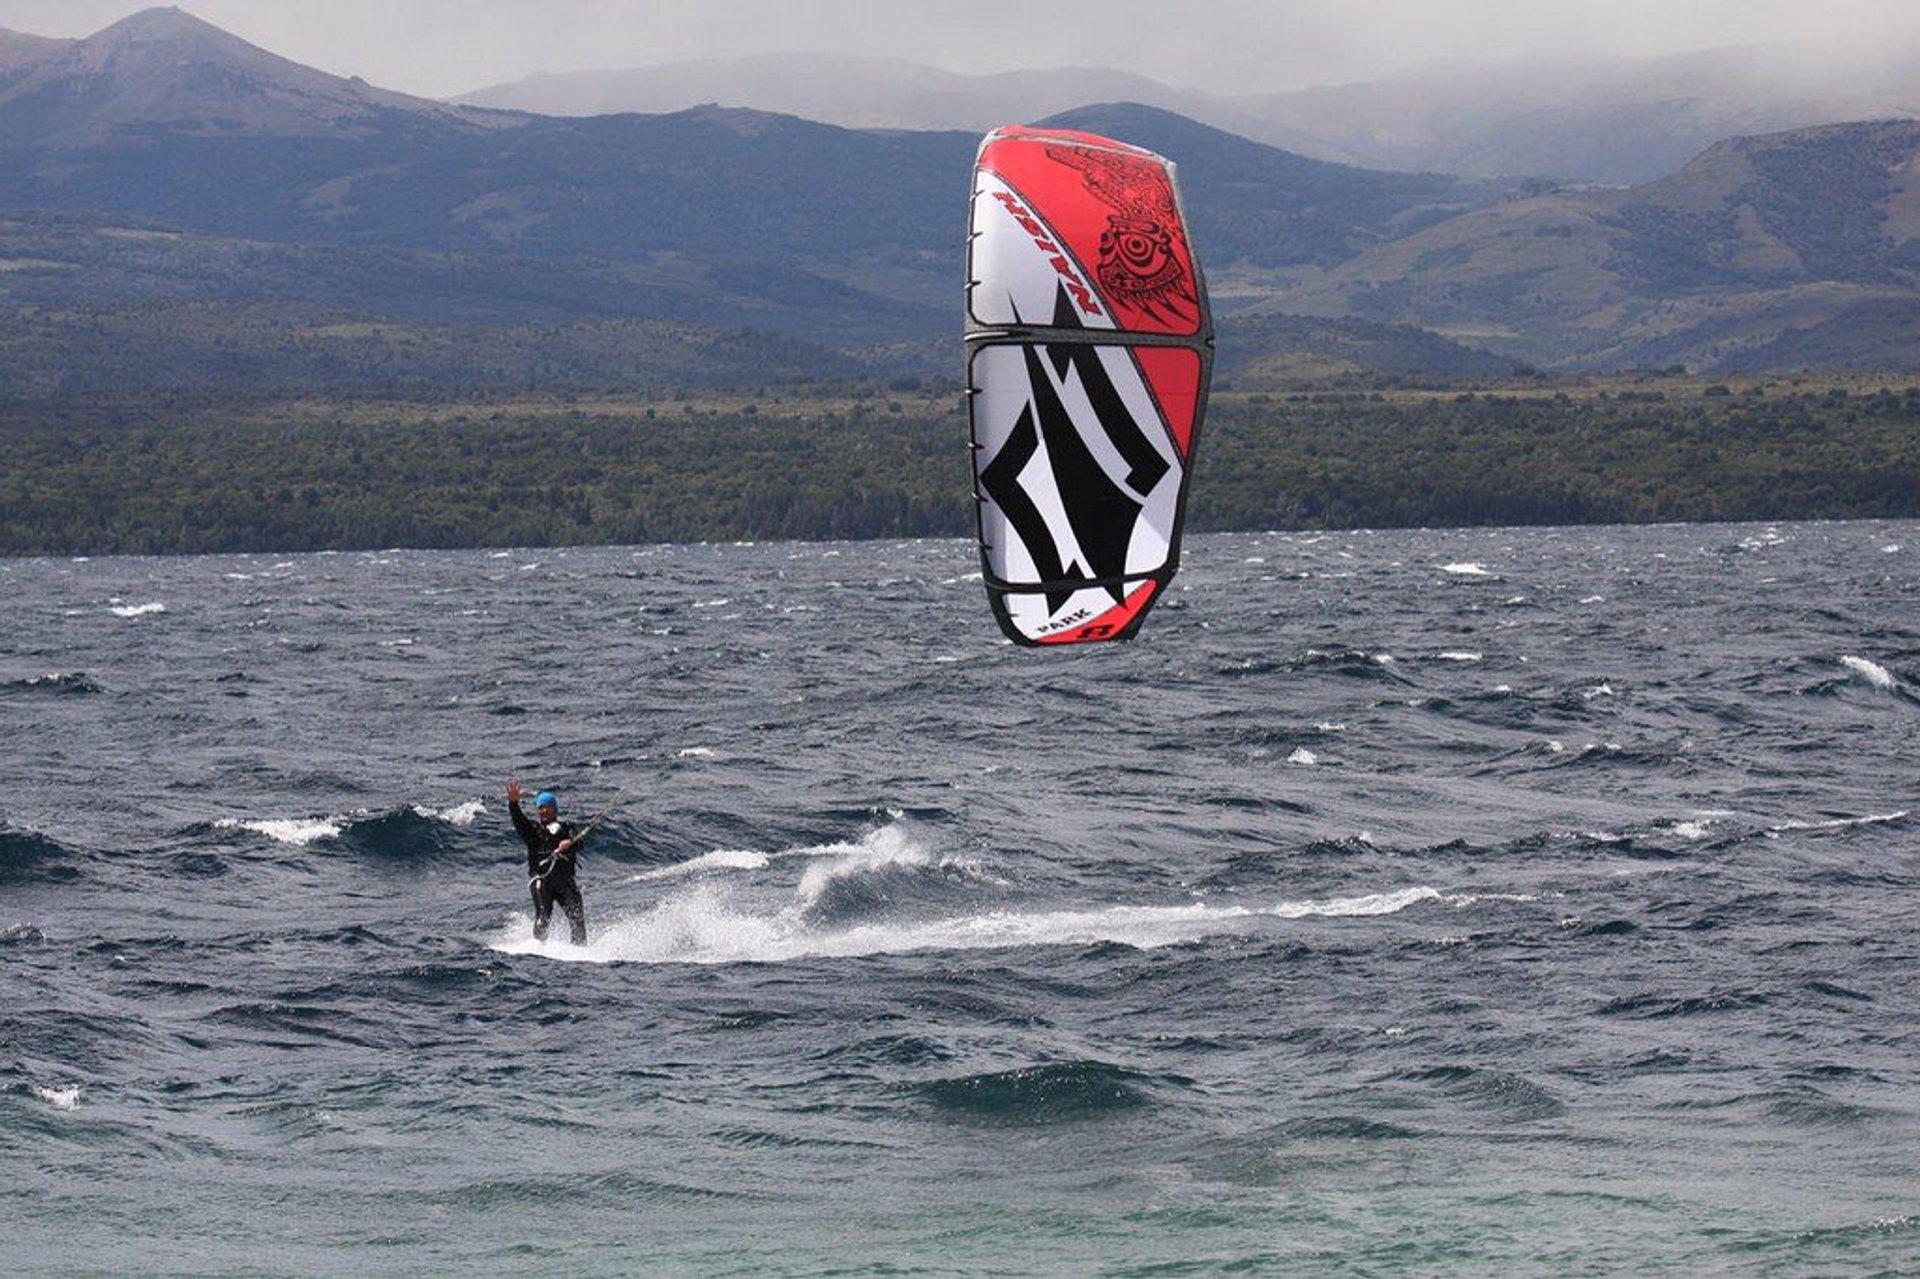 Kitesurfing on Nahuel Huapi in Argentina - Best Season 2020